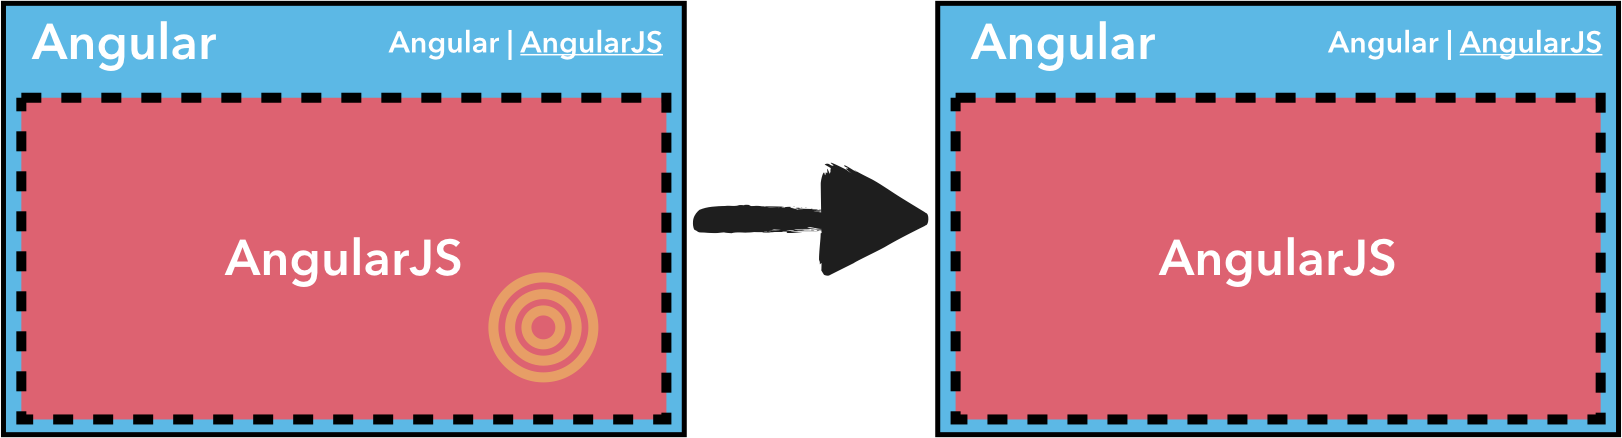 AngularJS triggers navigation andAngularJS owns theroute